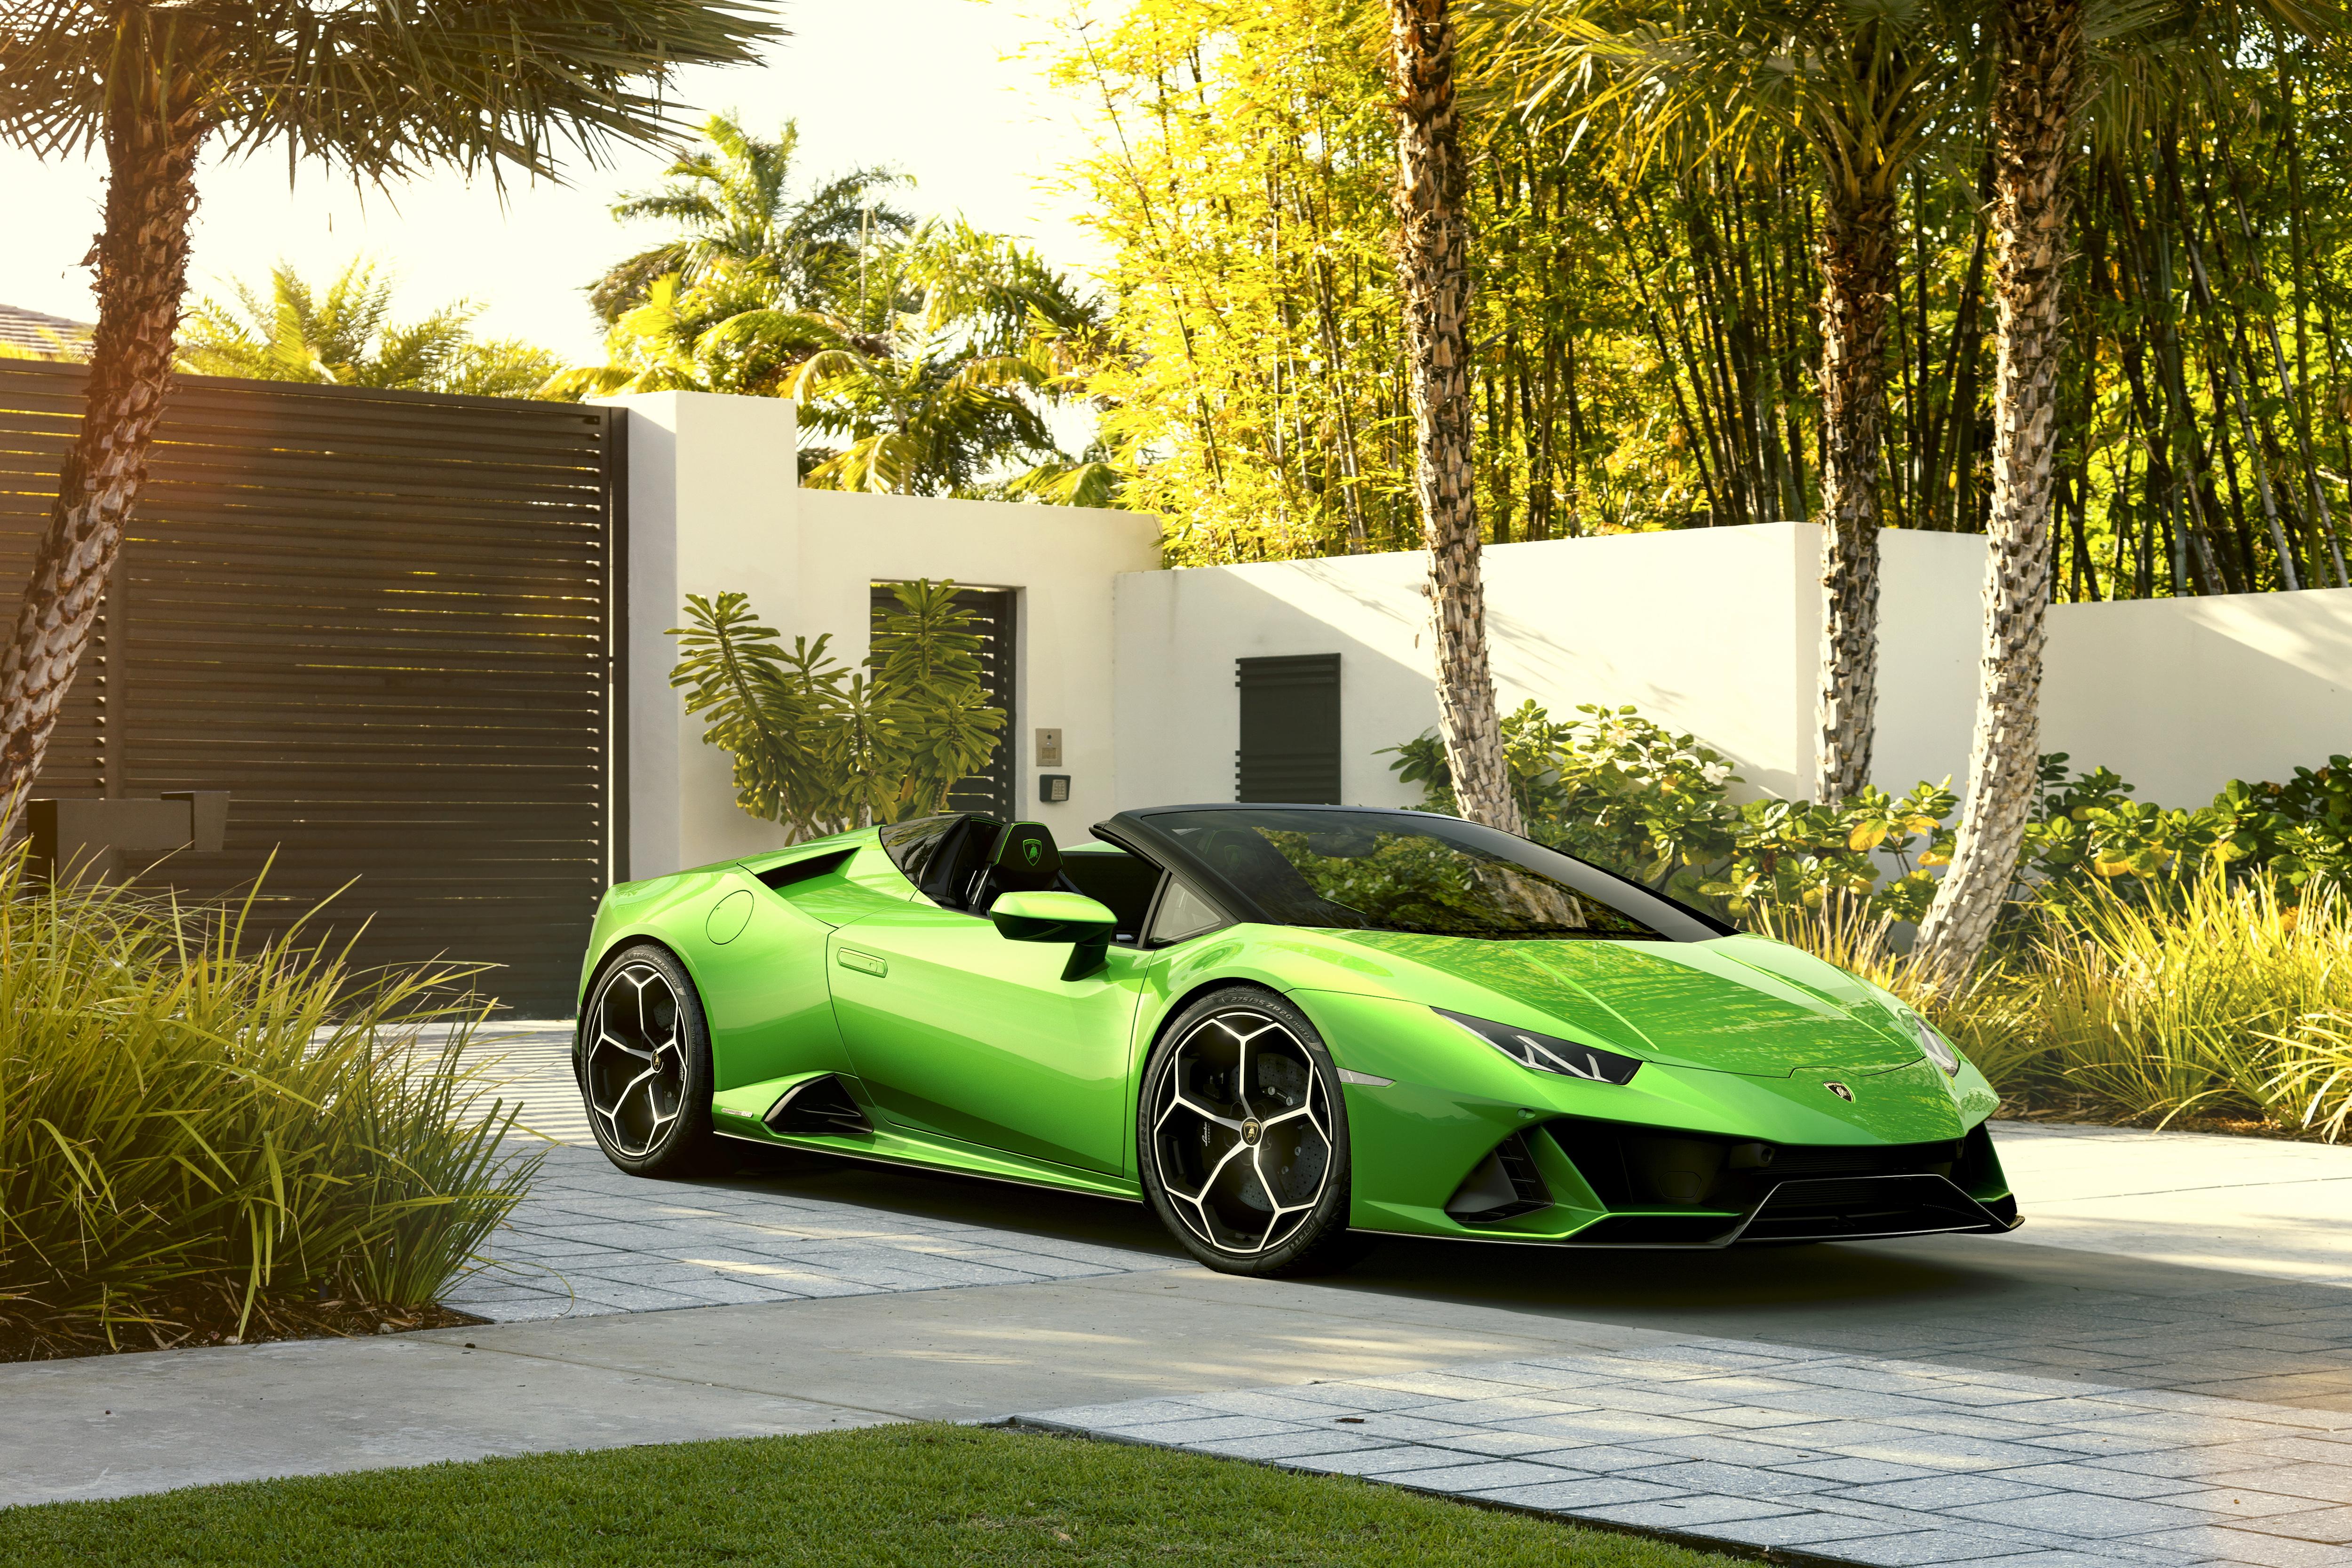 2019 Lamborghini Huracan Evo Spyder, HD Cars, 4k Wallpapers